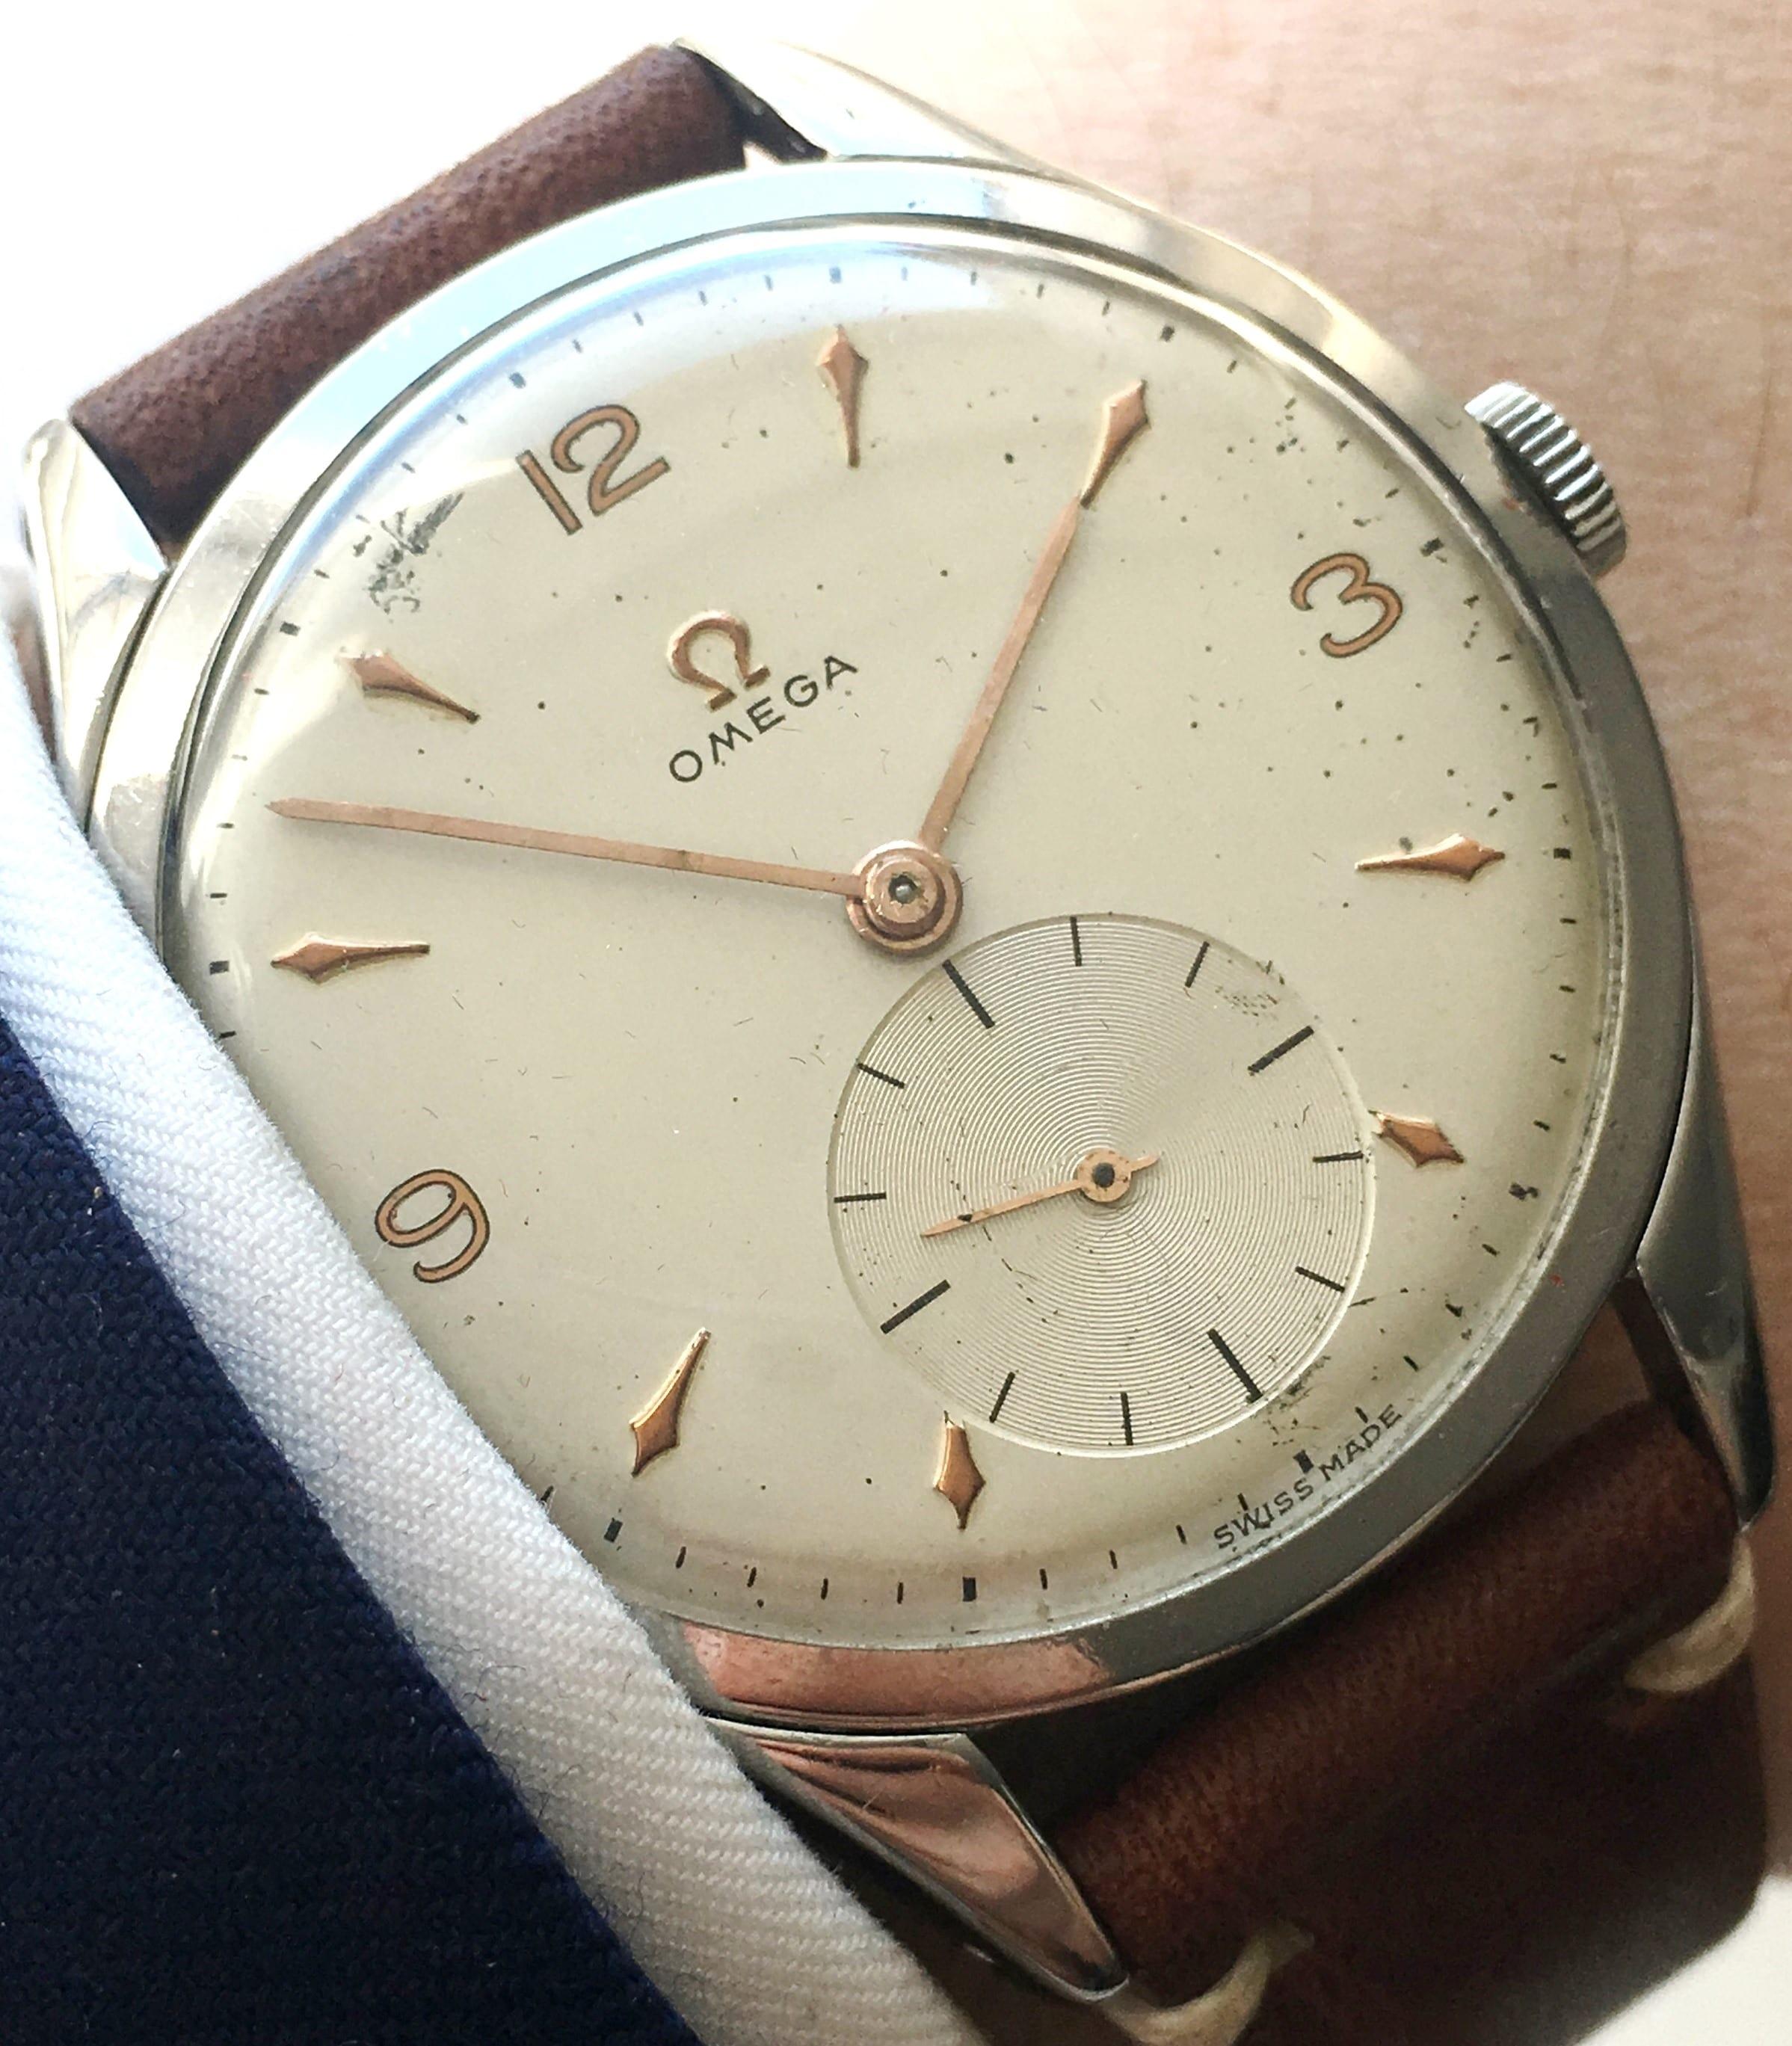 Schöne Omega 38mm Oversize Jumbo Uhr mit Vintage Ecru Band - Vintage Portfolio